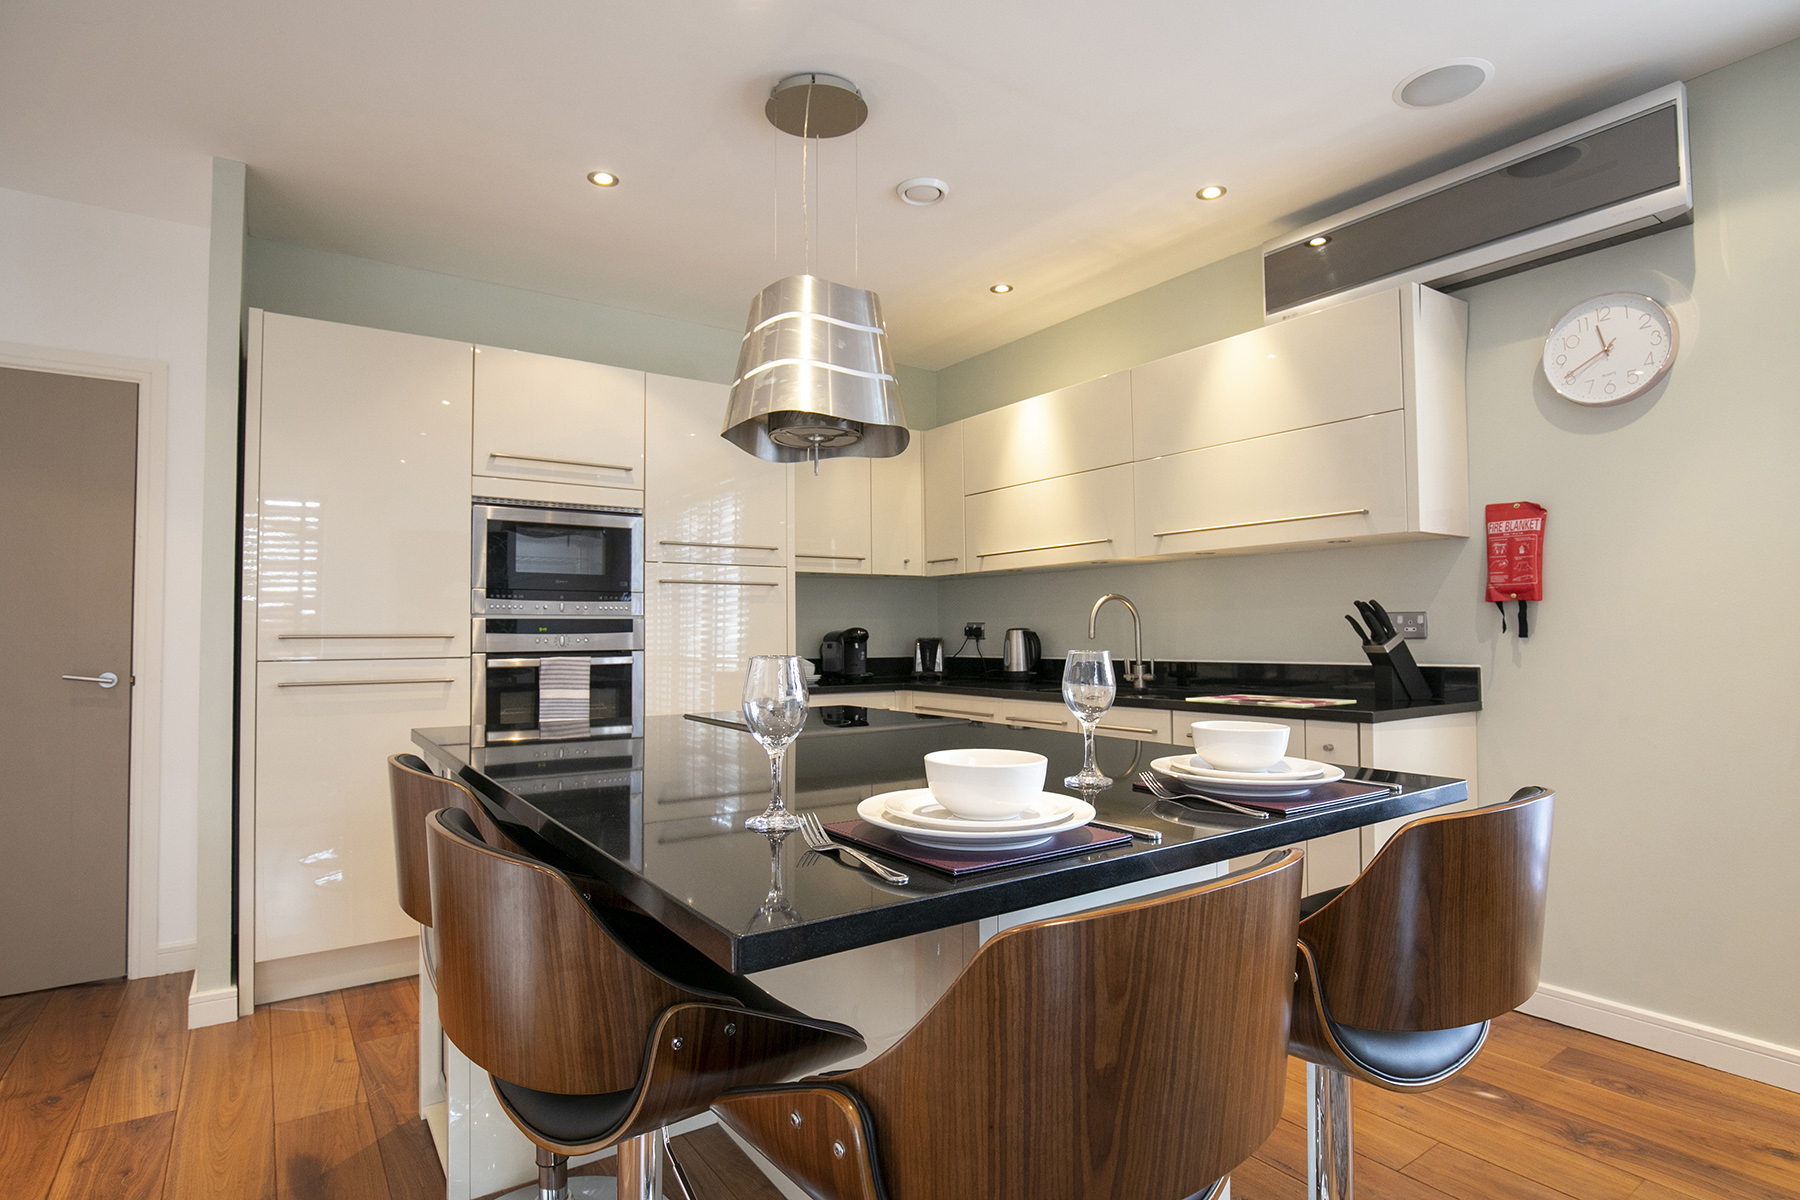 Kitchen at Wallis Square Apartments, Centre, Farnborough - Citybase Apartments